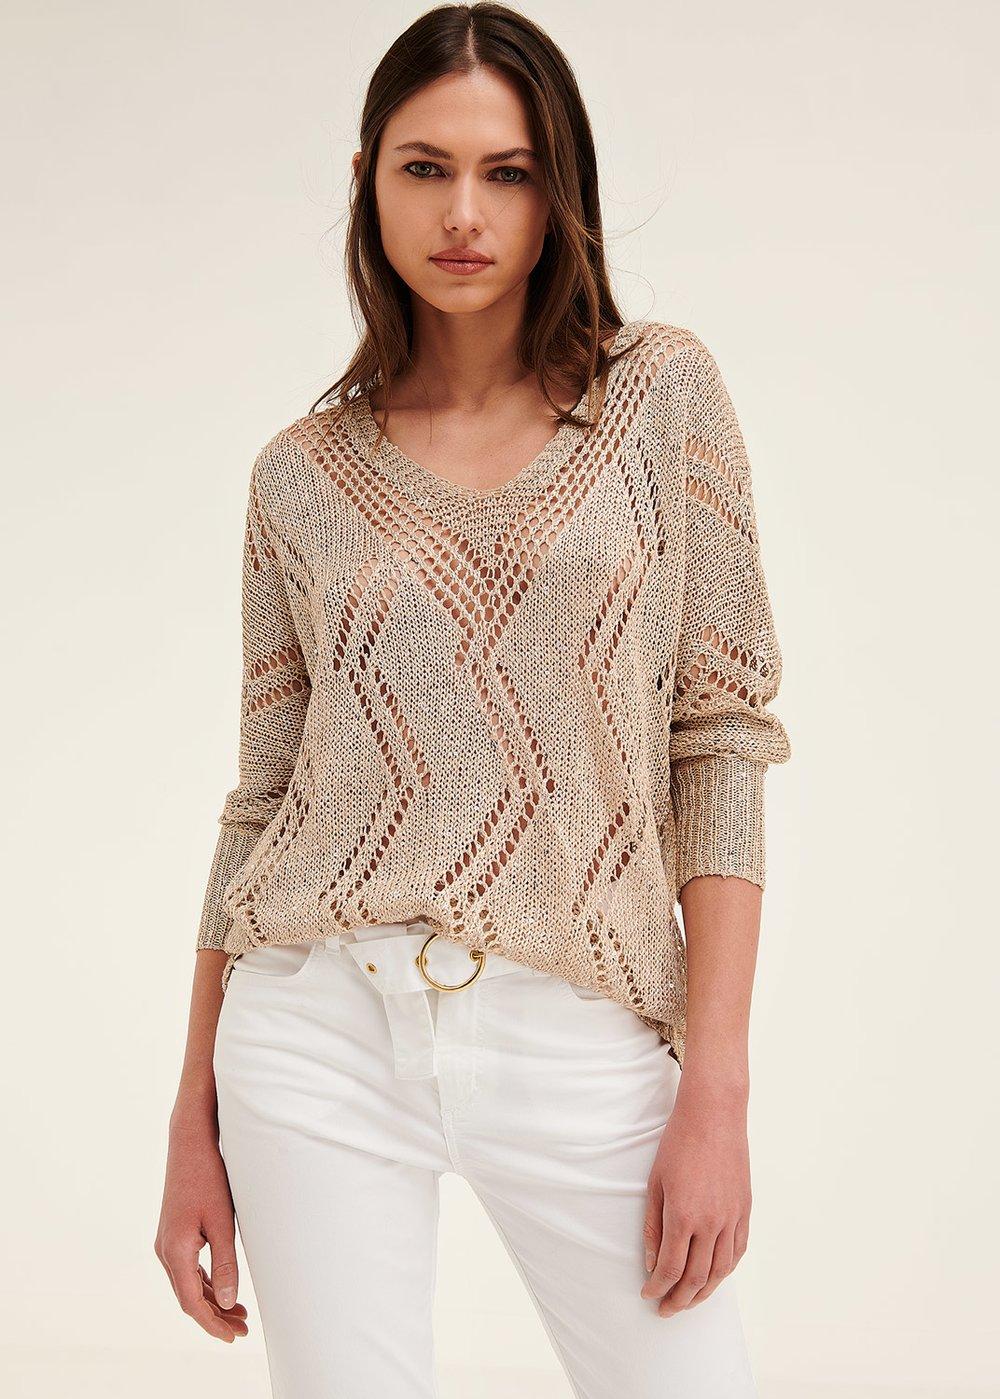 Matias openwork sweater - Taupe - Woman